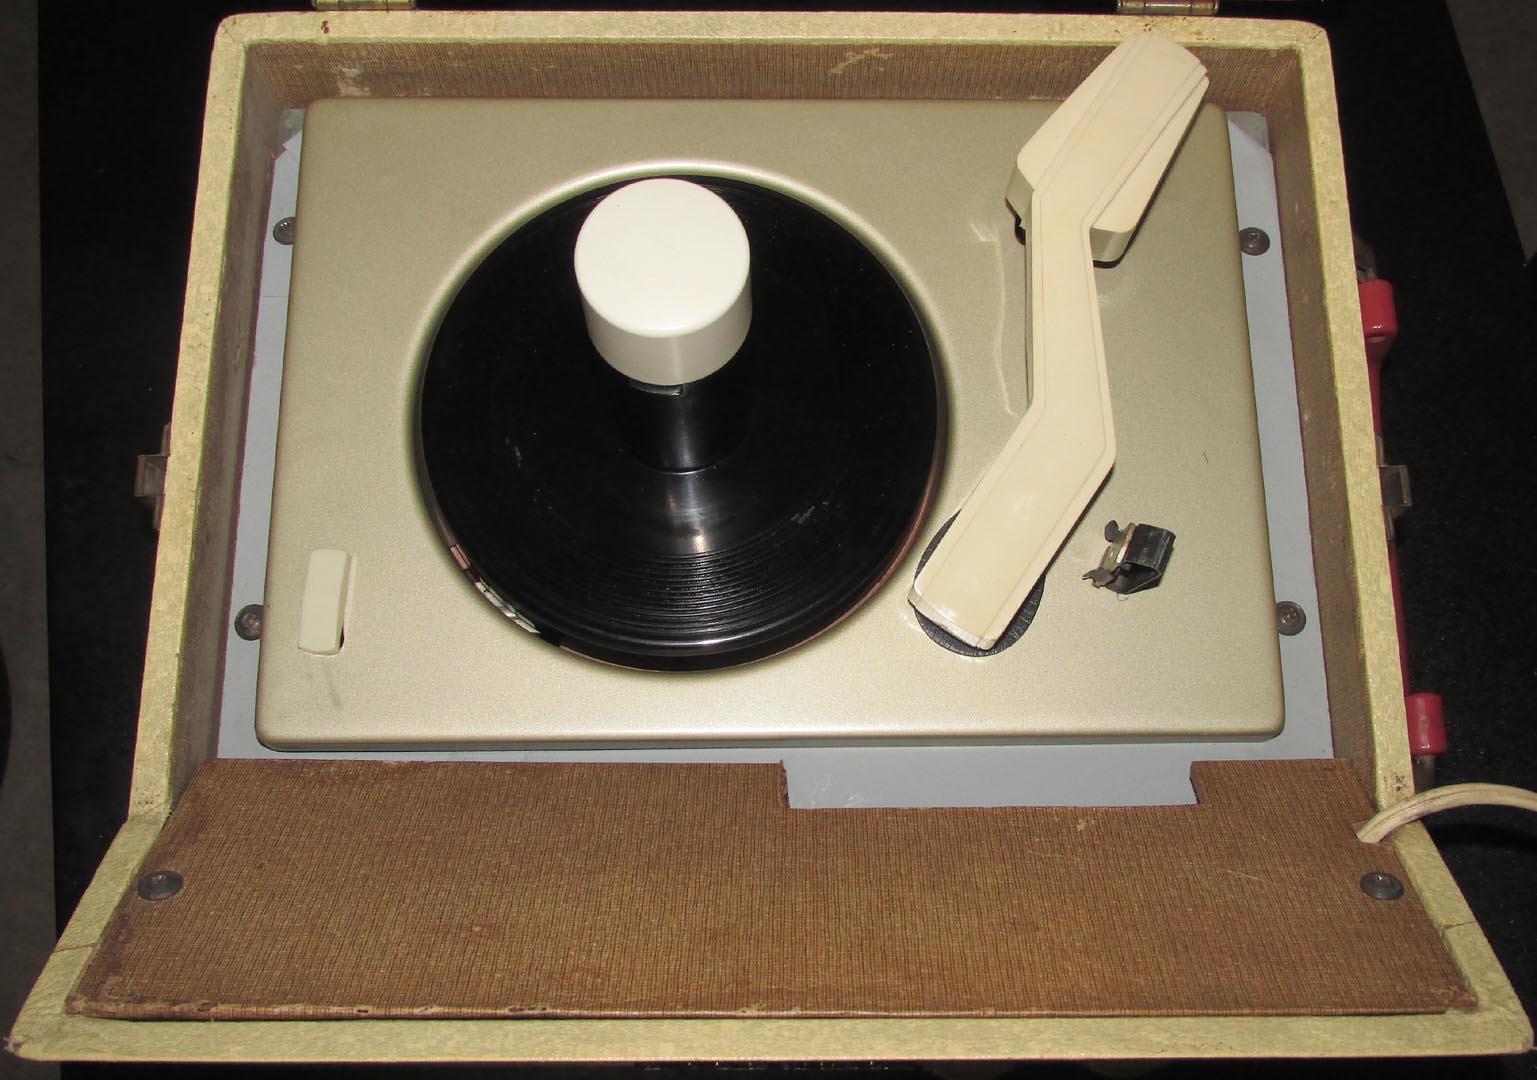 RCA 45 Record Player 8-EY-31KE 100% Rebuilt | 20thcenturydepot